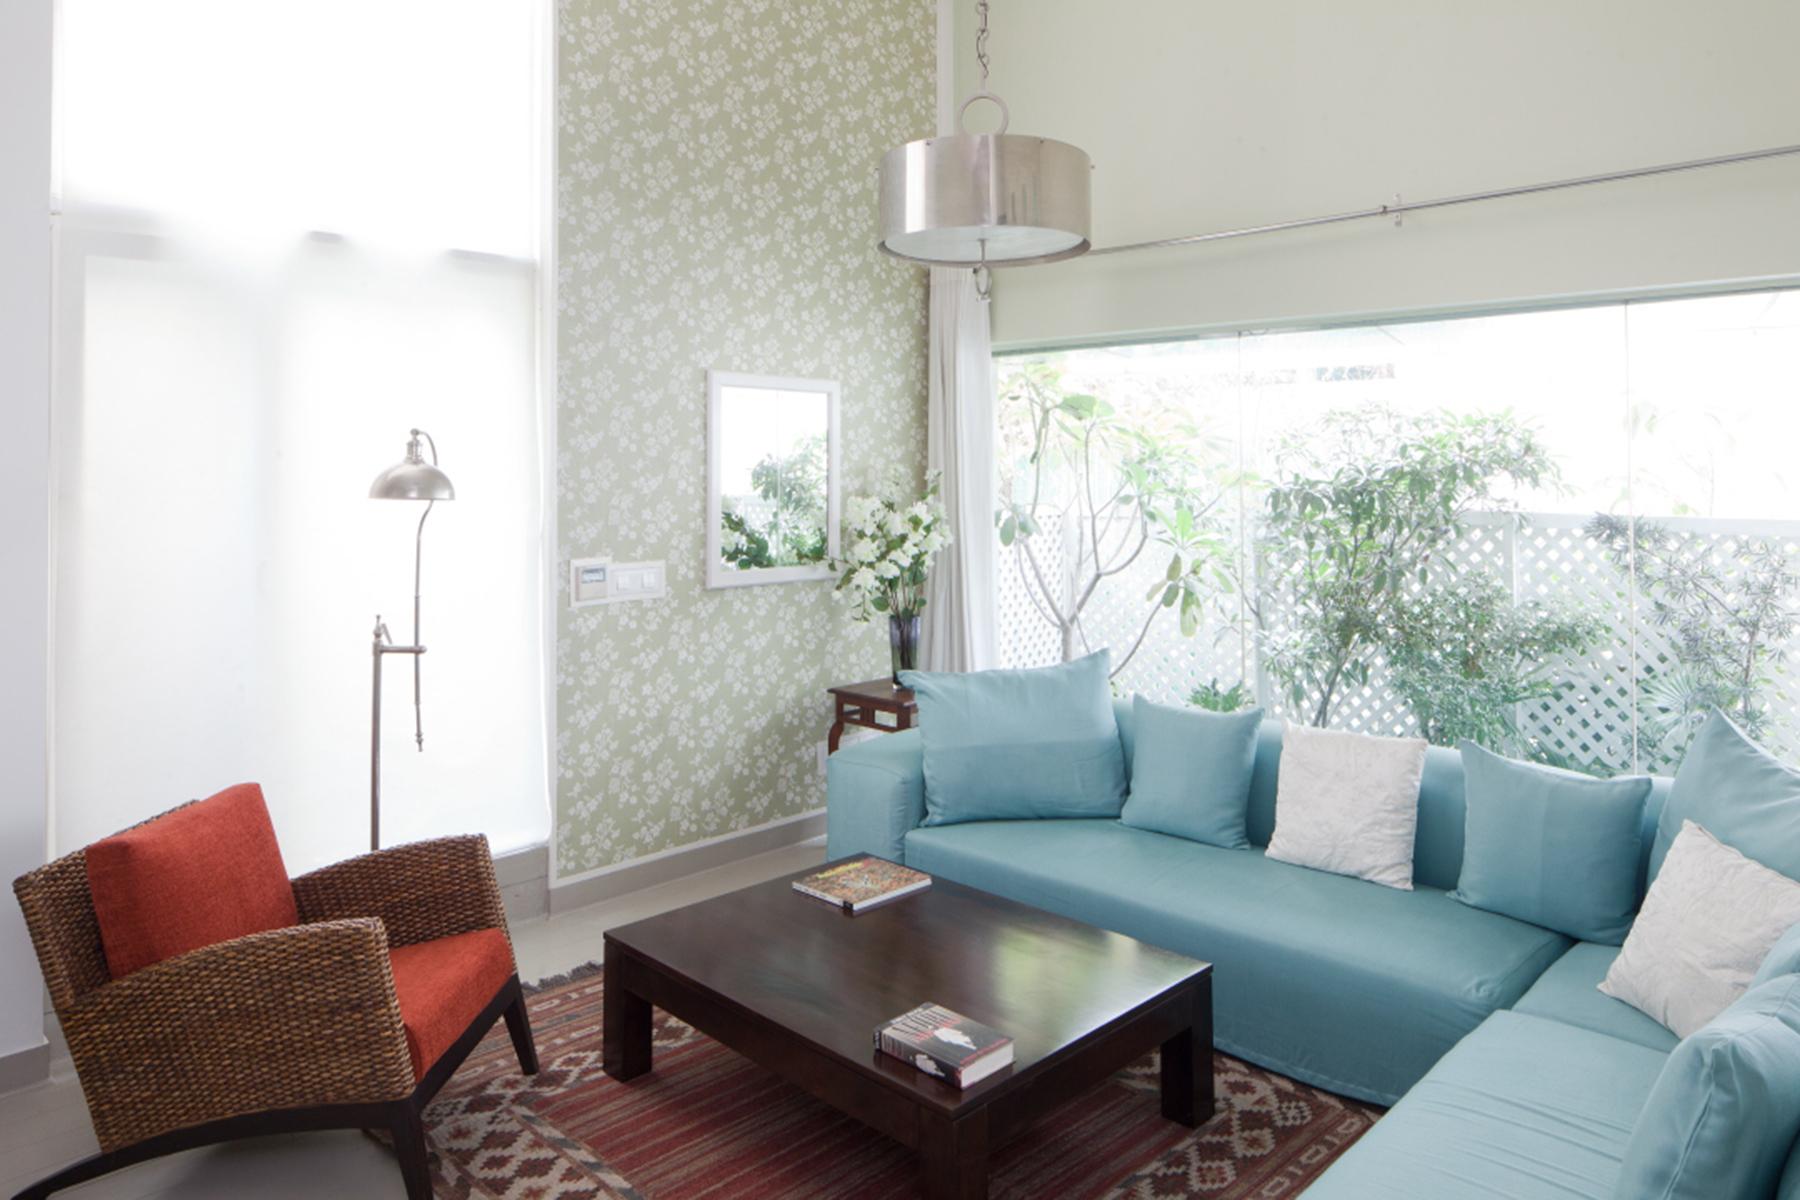 Multi-Family Home for Sale at Office cum residence in SDA New Delhi, Delhi 110029 India